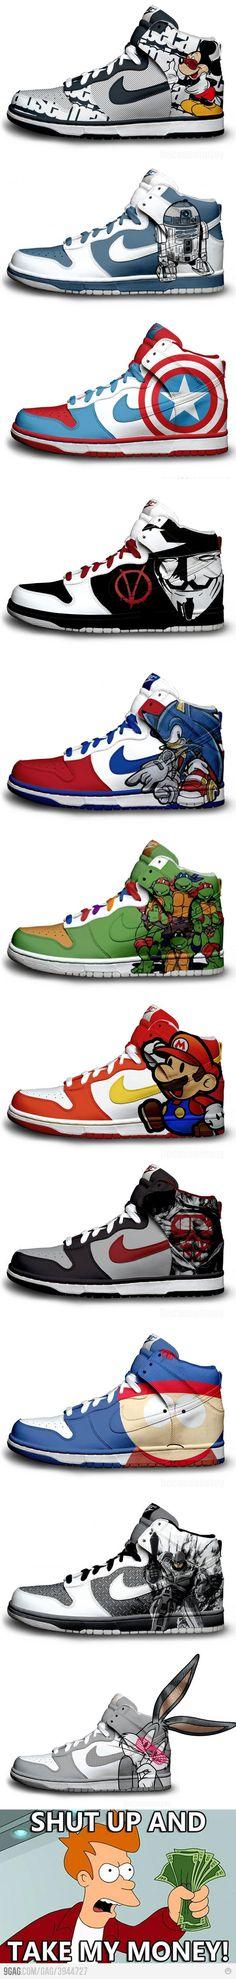 New Nike designs